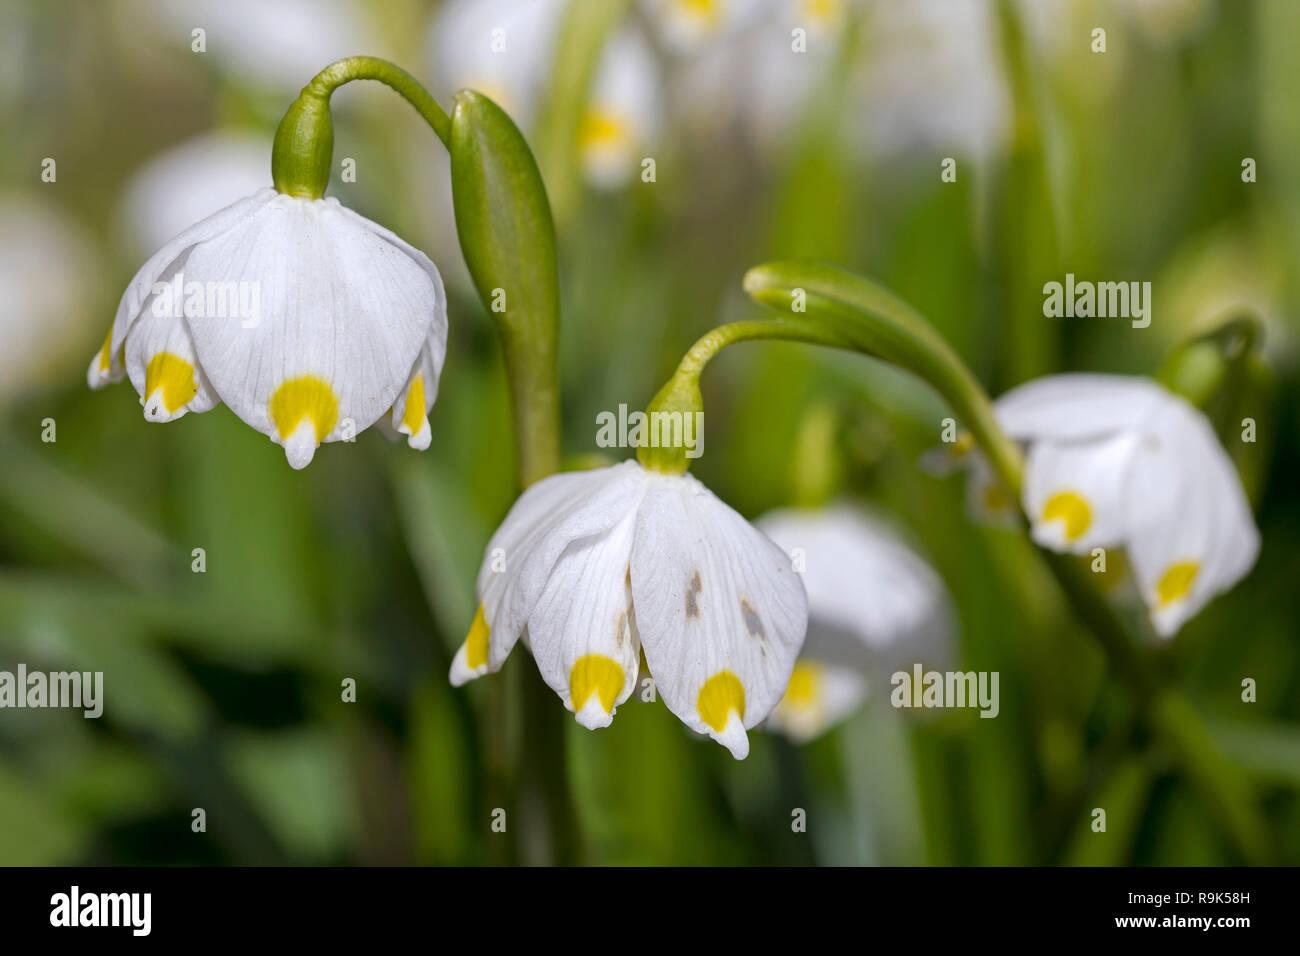 Close up of spring snowflakes (Leucojum vernum / Galanthus vernus) in flower in spring - Stock Image